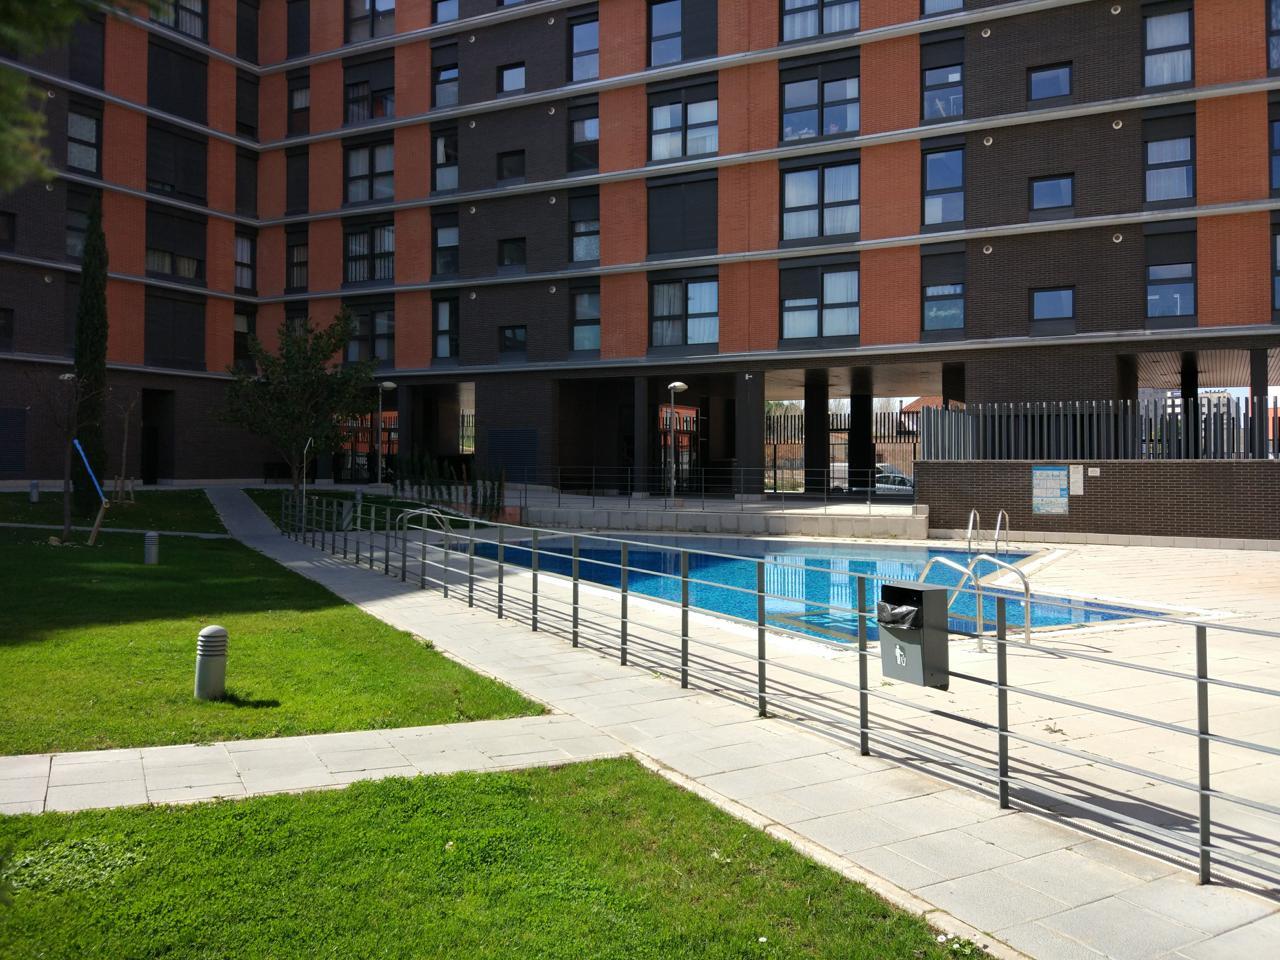 piso inversores con inquilino obra nueva zaragoza|publipisos inmobiliarias